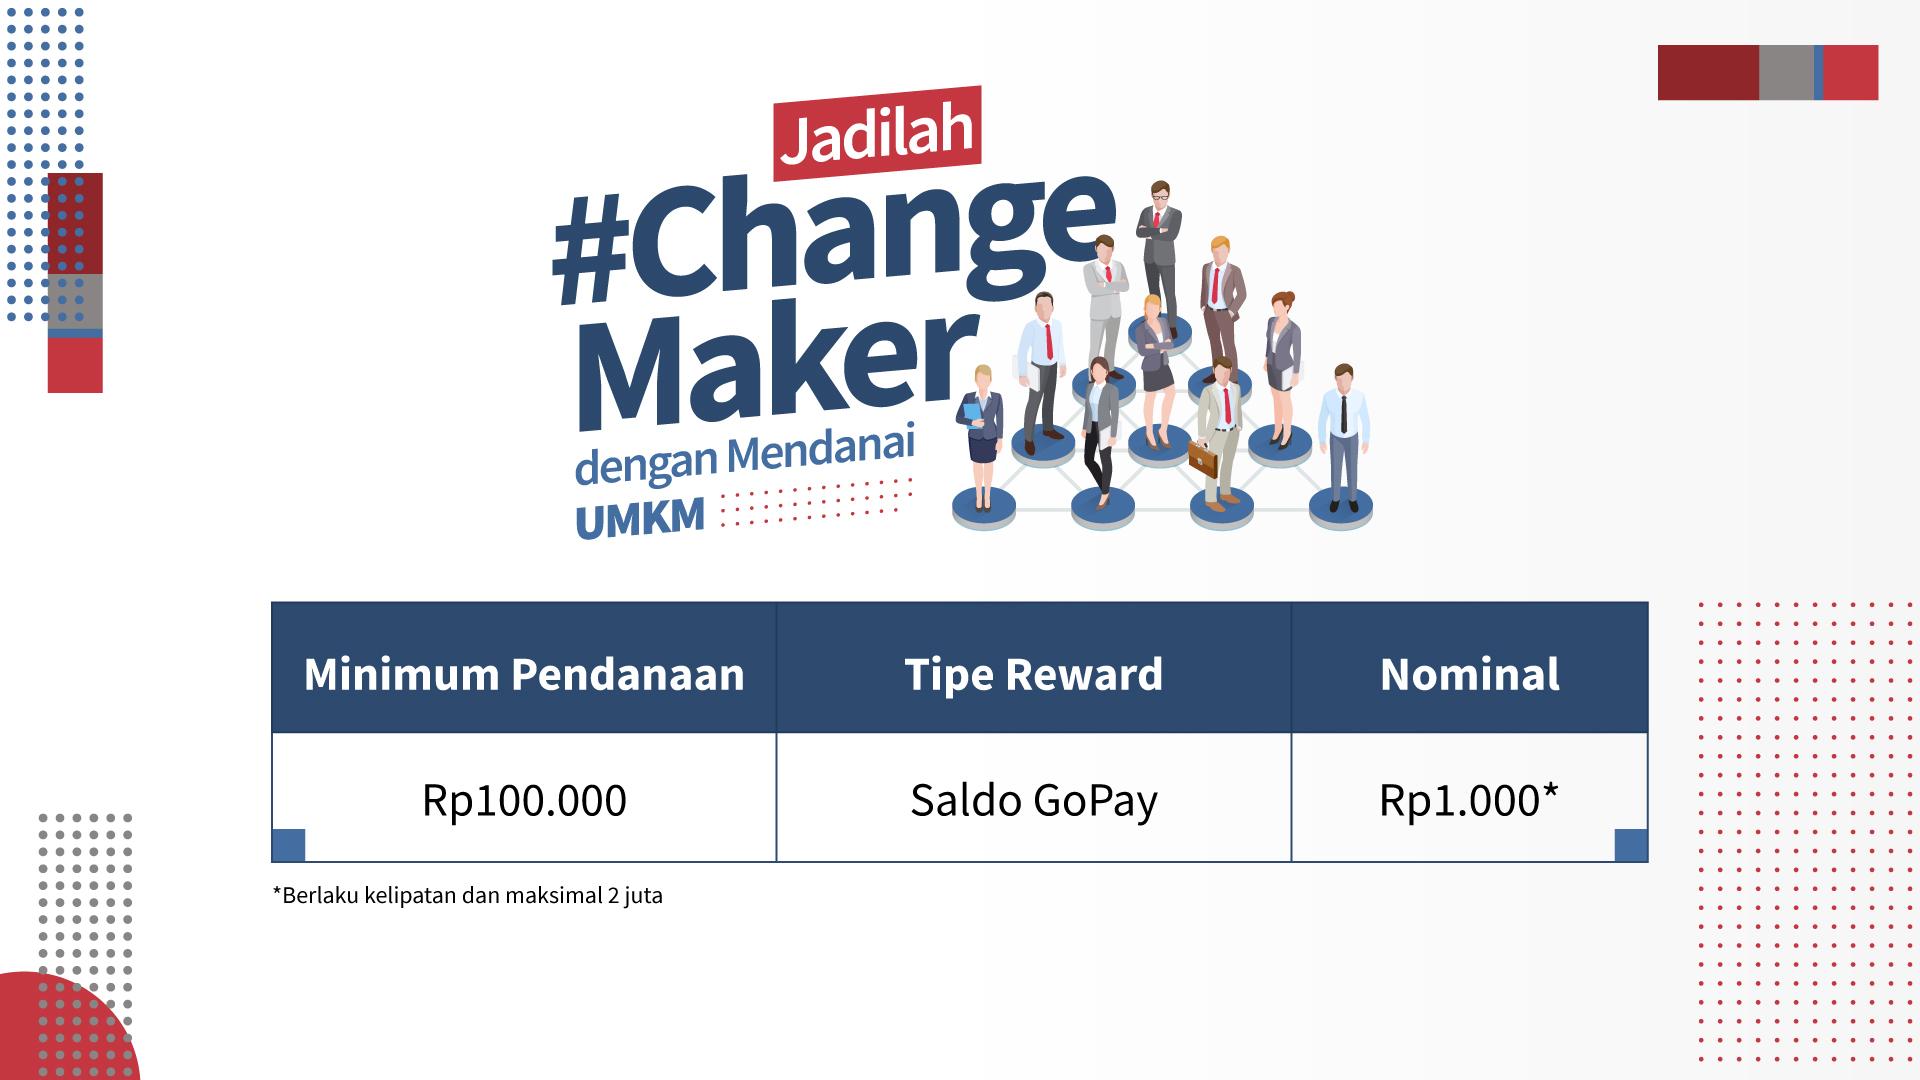 [PROMO] Jadilah #ChangeMaker dengan Mendanai UMKM, Nikmati Cashback-nya!